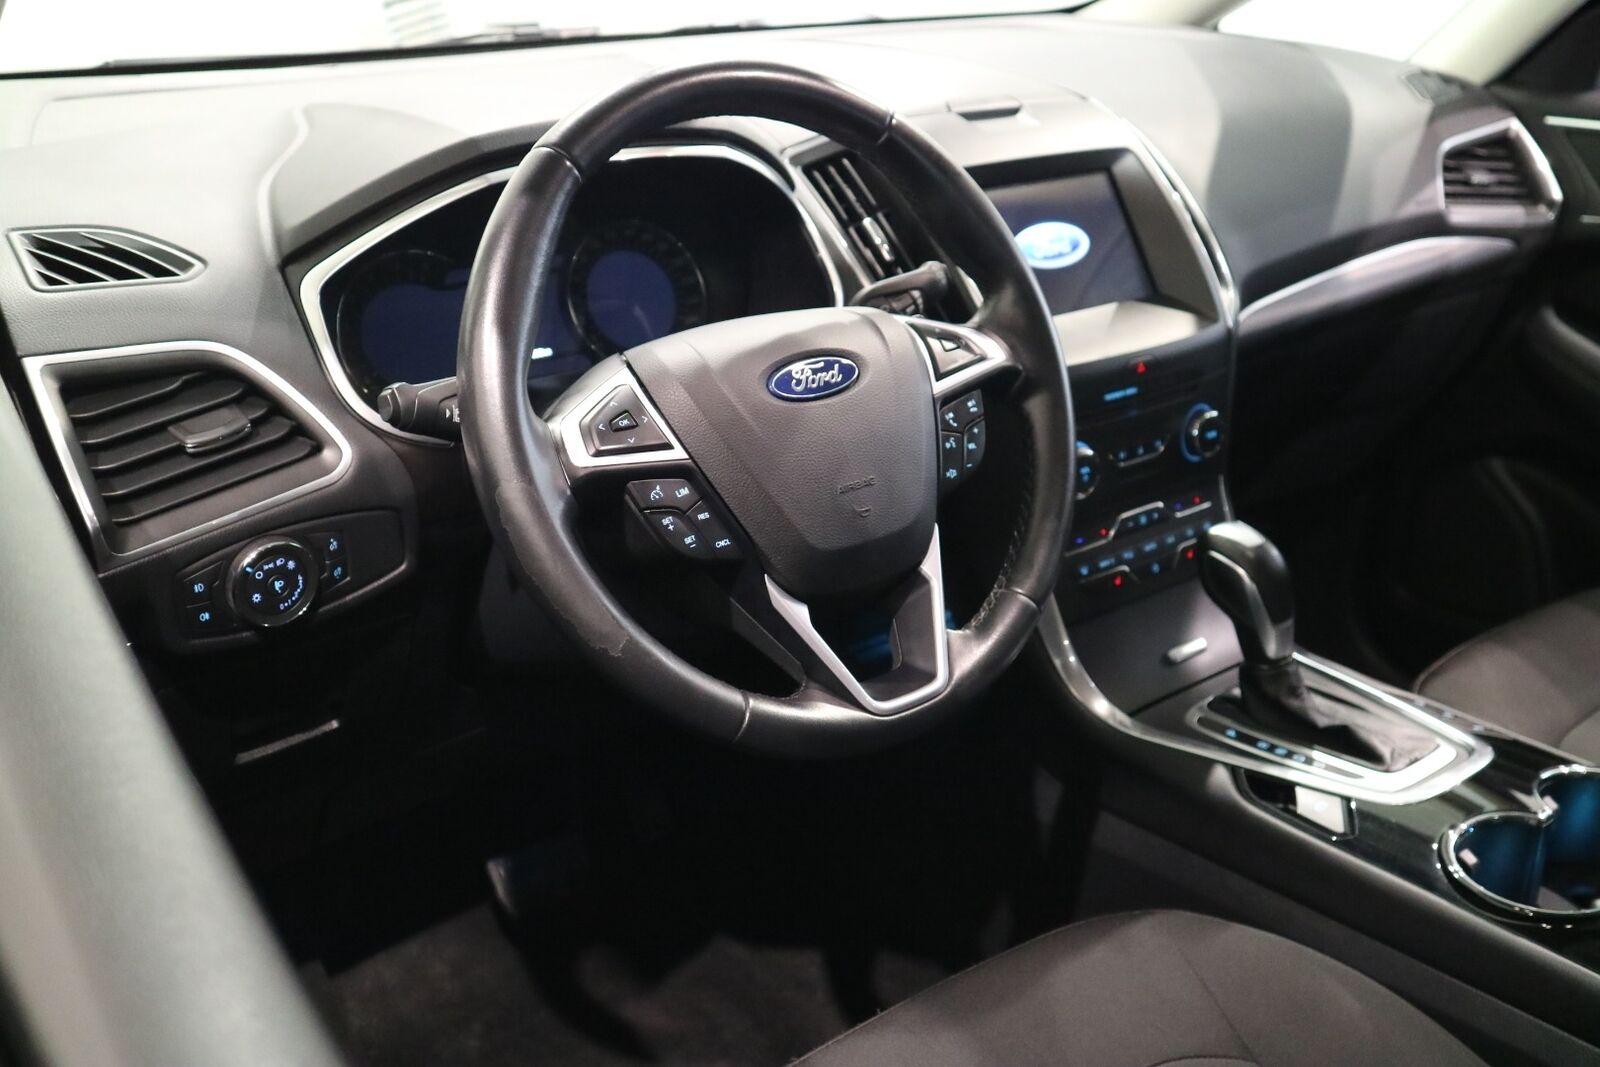 Ford Galaxy 2,0 TDCi 180 Titanium aut. - billede 11